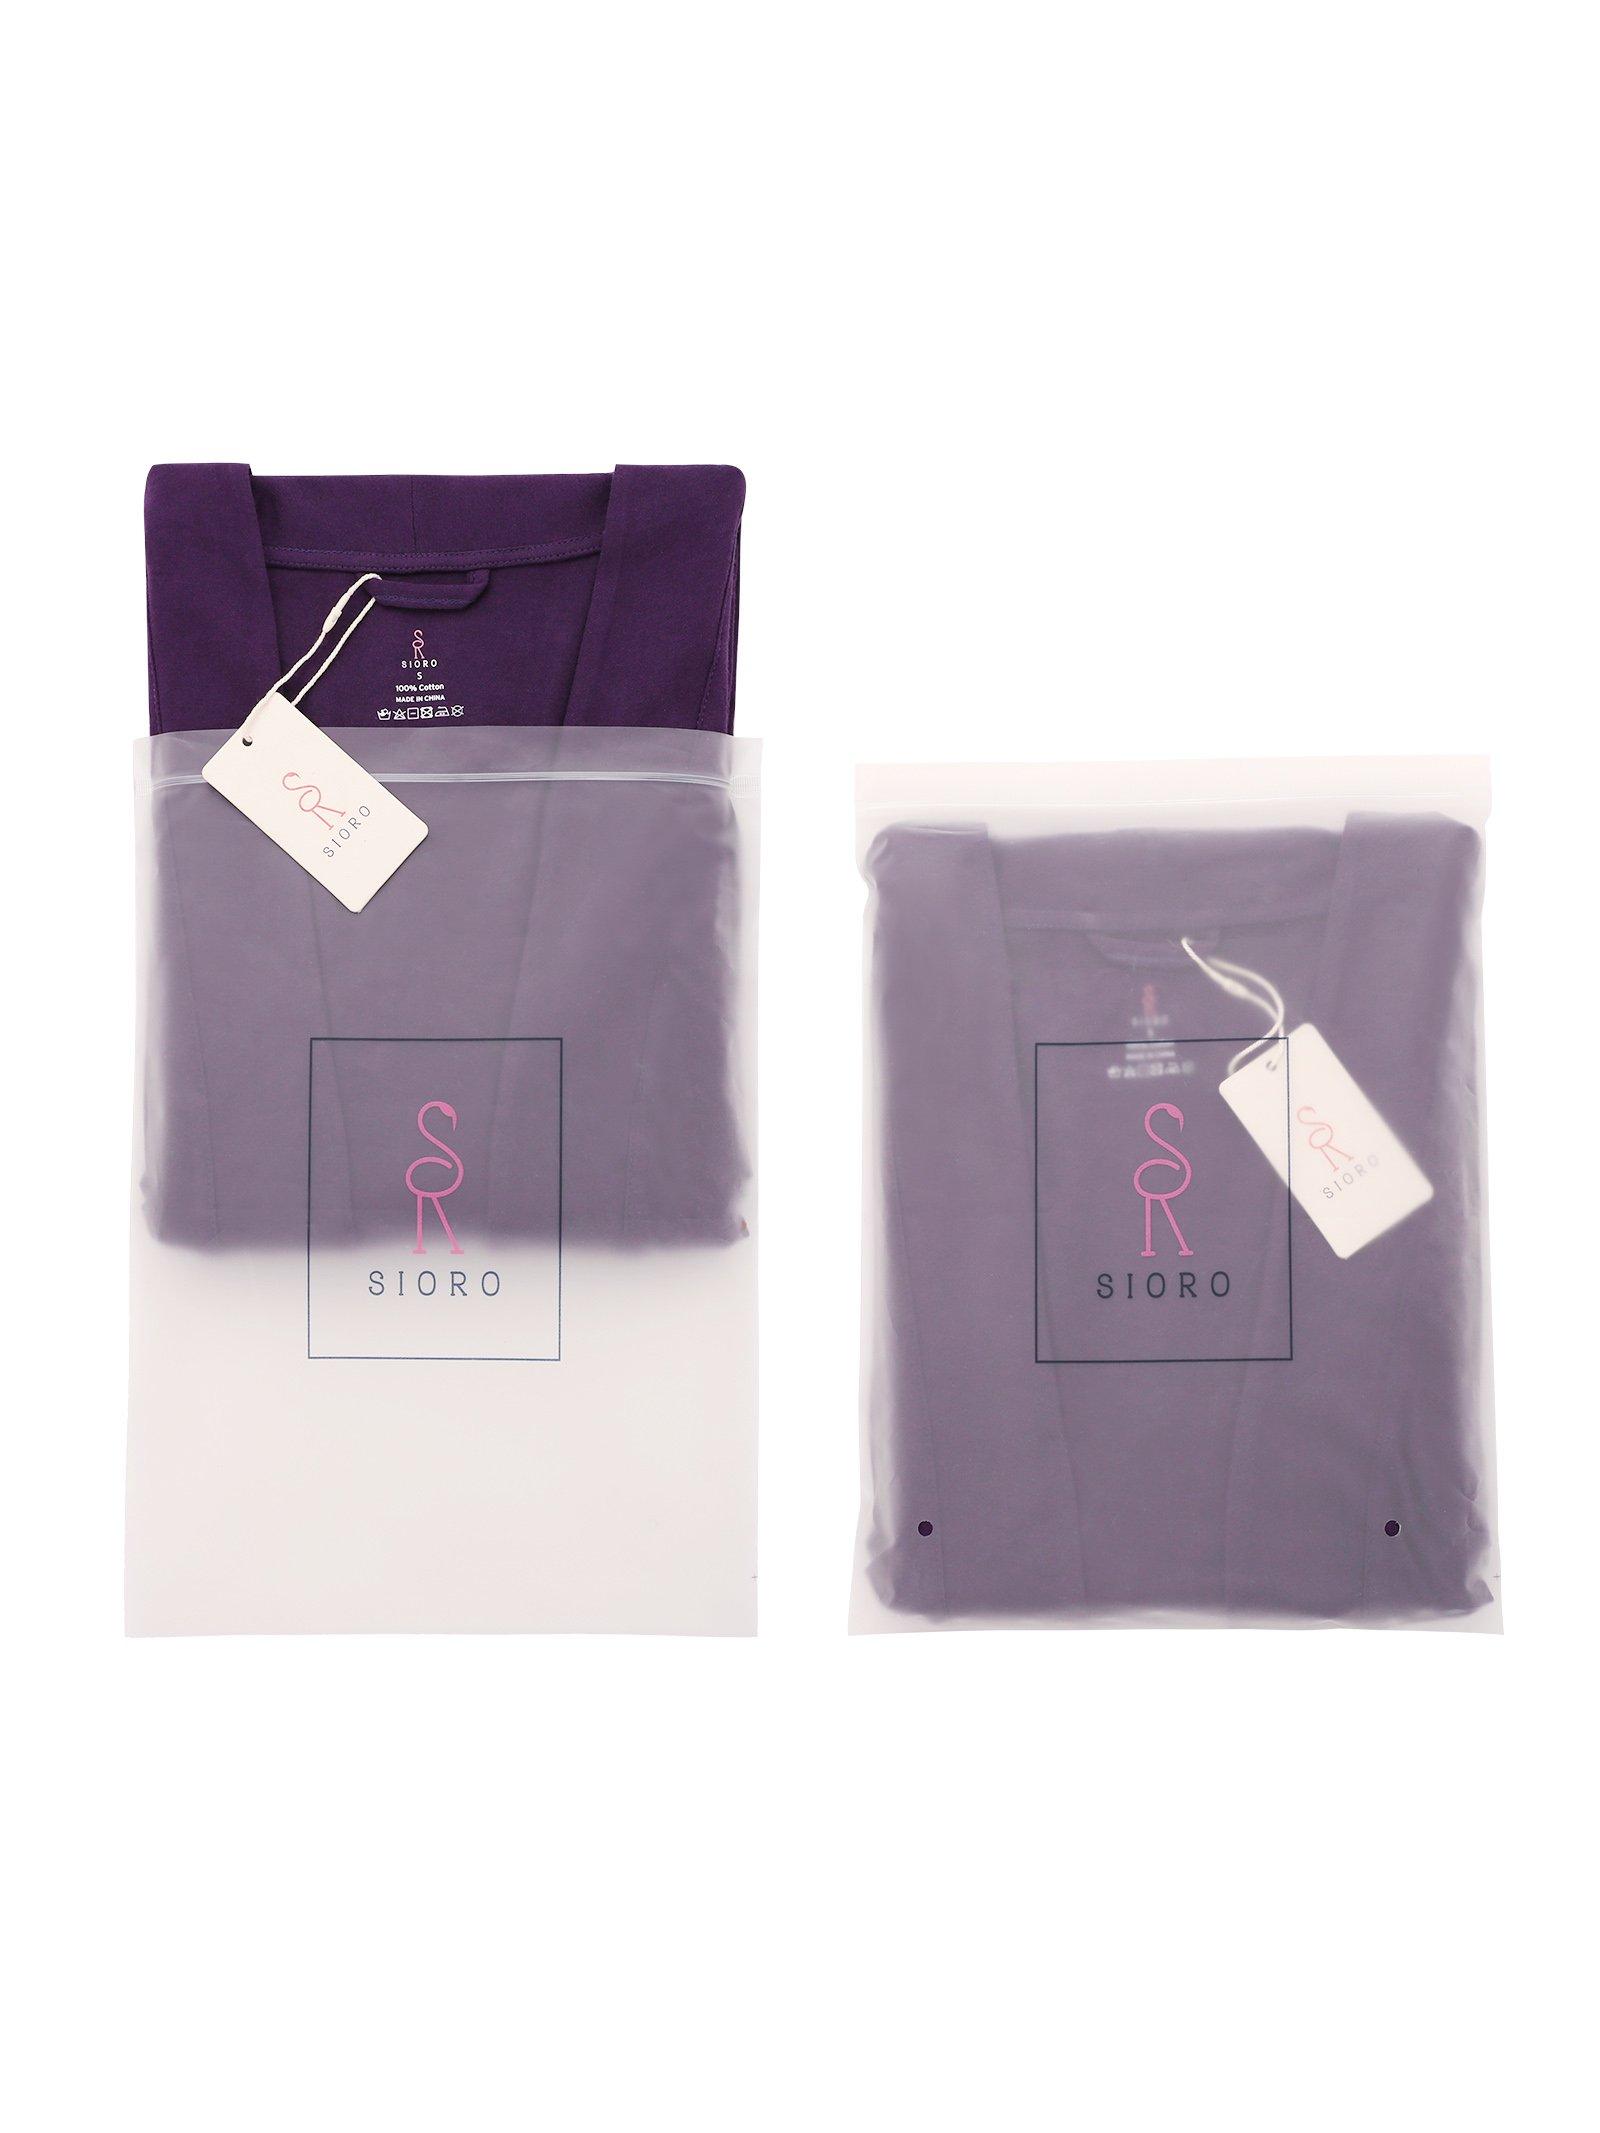 SIORO Cotton Robes Lightweight Kimono Robe Gowns Soft Knit Bathrobe Nightwear V-Neck Loungewear Sexy Sleepwear Short for Women, Black, S by SIORO (Image #7)